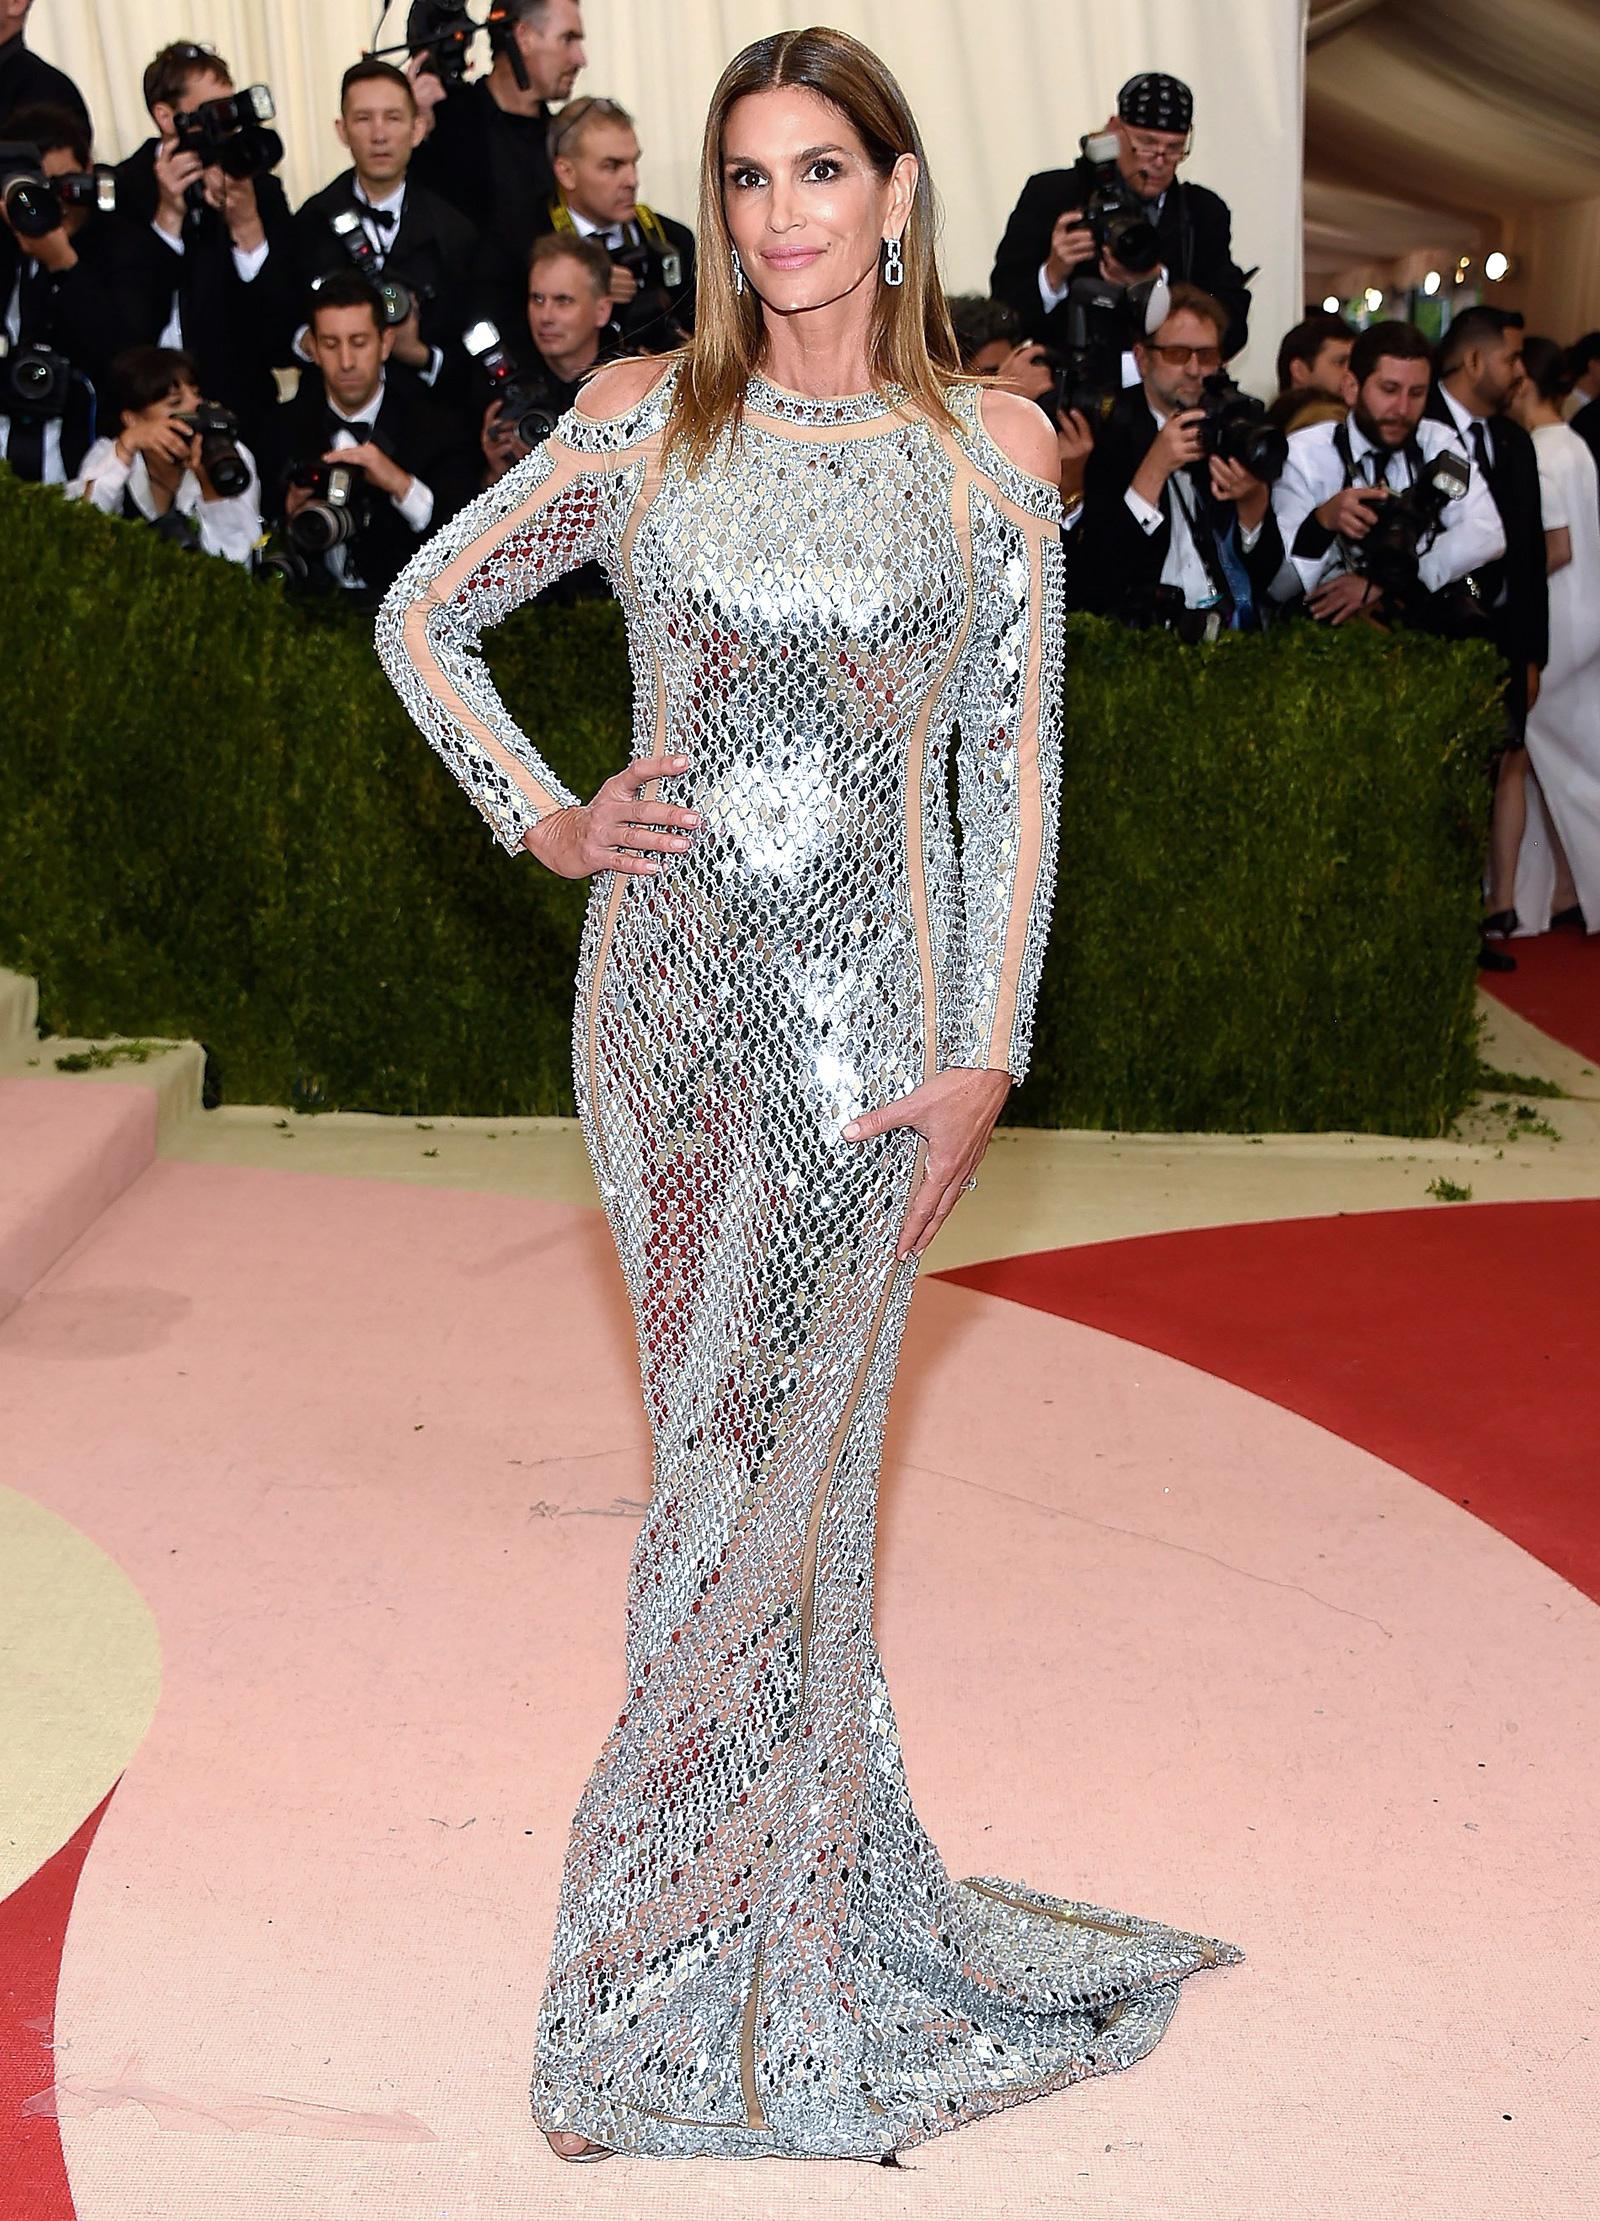 Met Gala 2016 Red Carpet: Cindy Crawford Stuns in Sheer-Paneled Gown